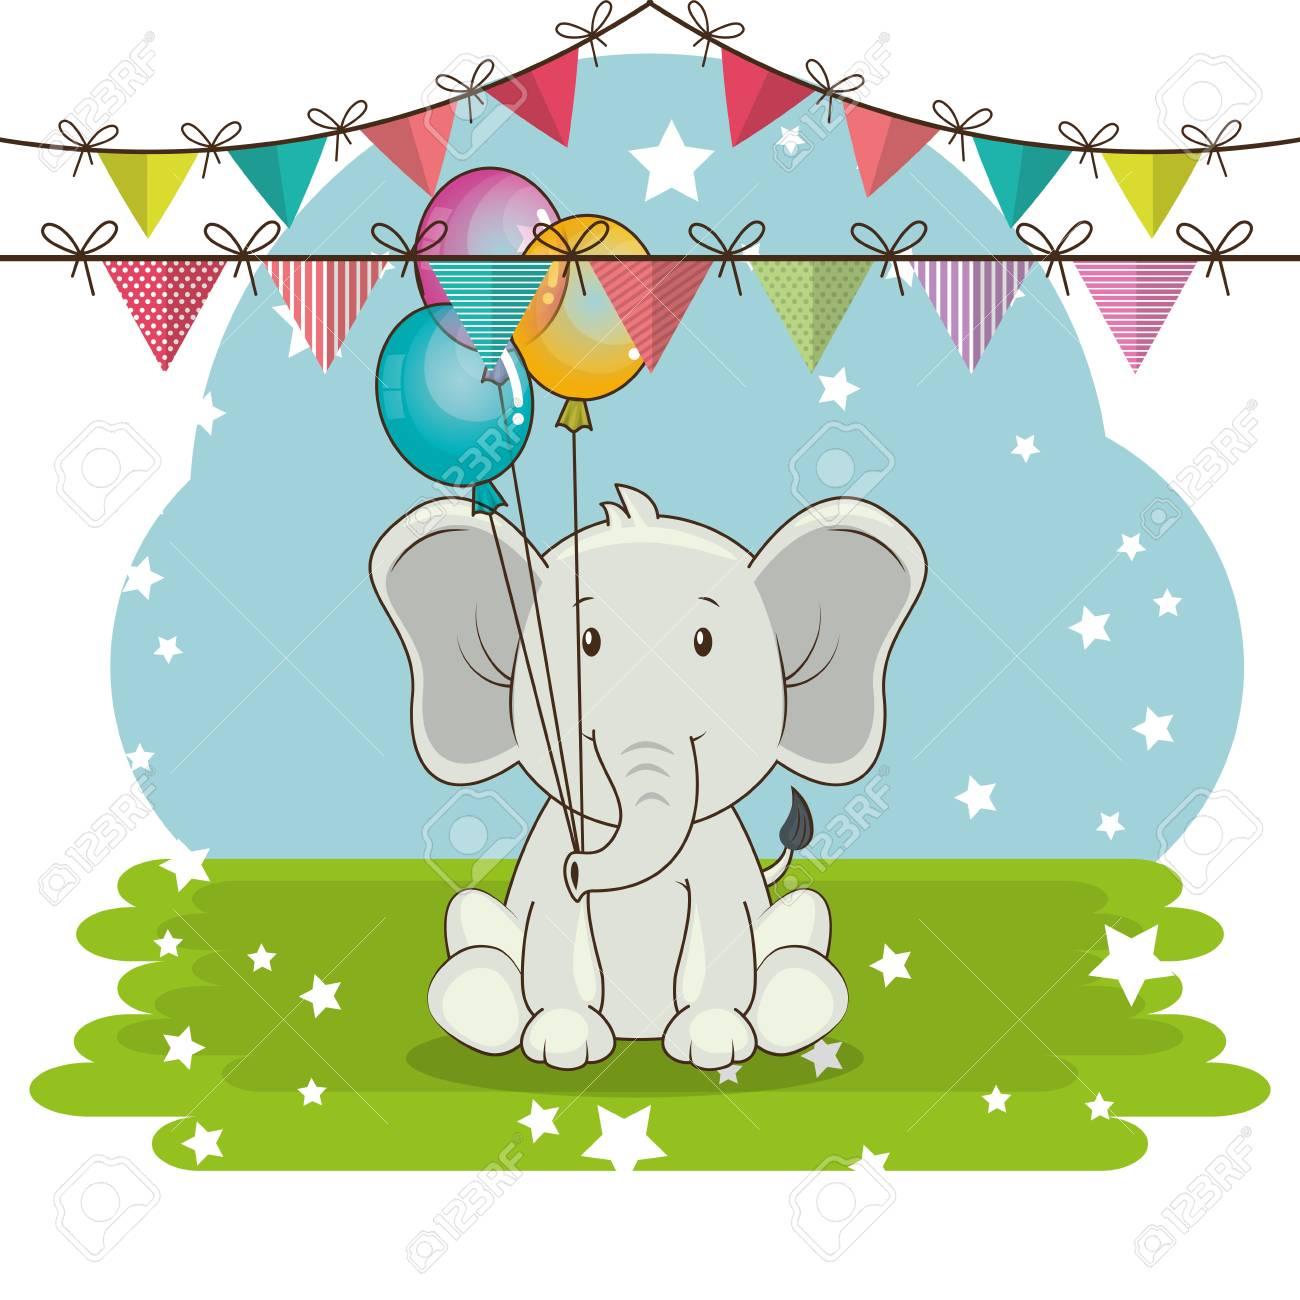 Happy Birthday Card With Cute Elephant Vector Illustration Design Stock